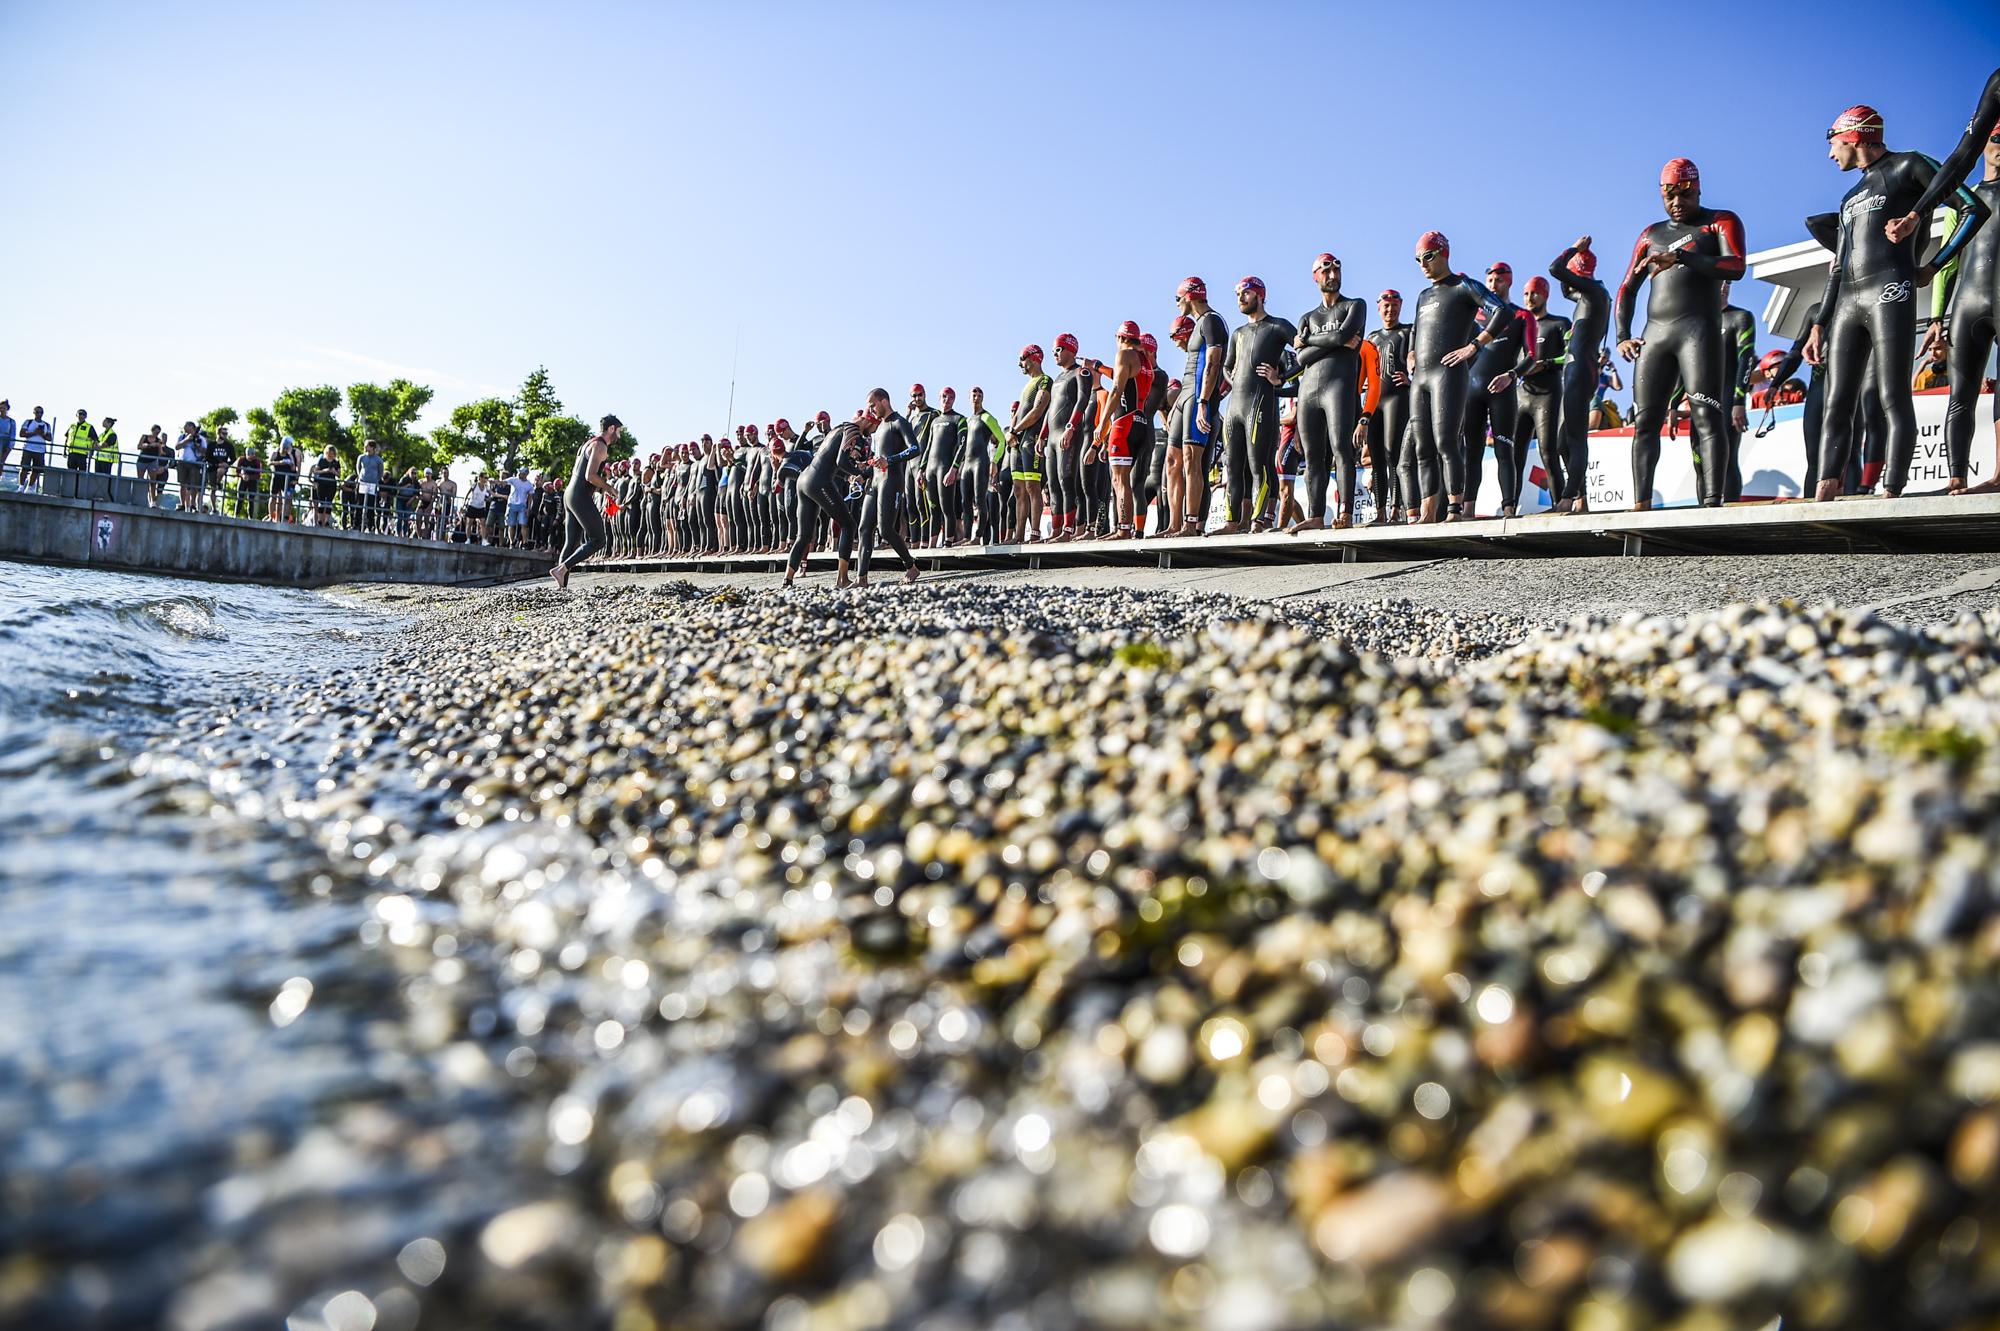 The 31st edition of La Tour Geneva Triathlon breaks records to become the biggest triathlon in Switzerland